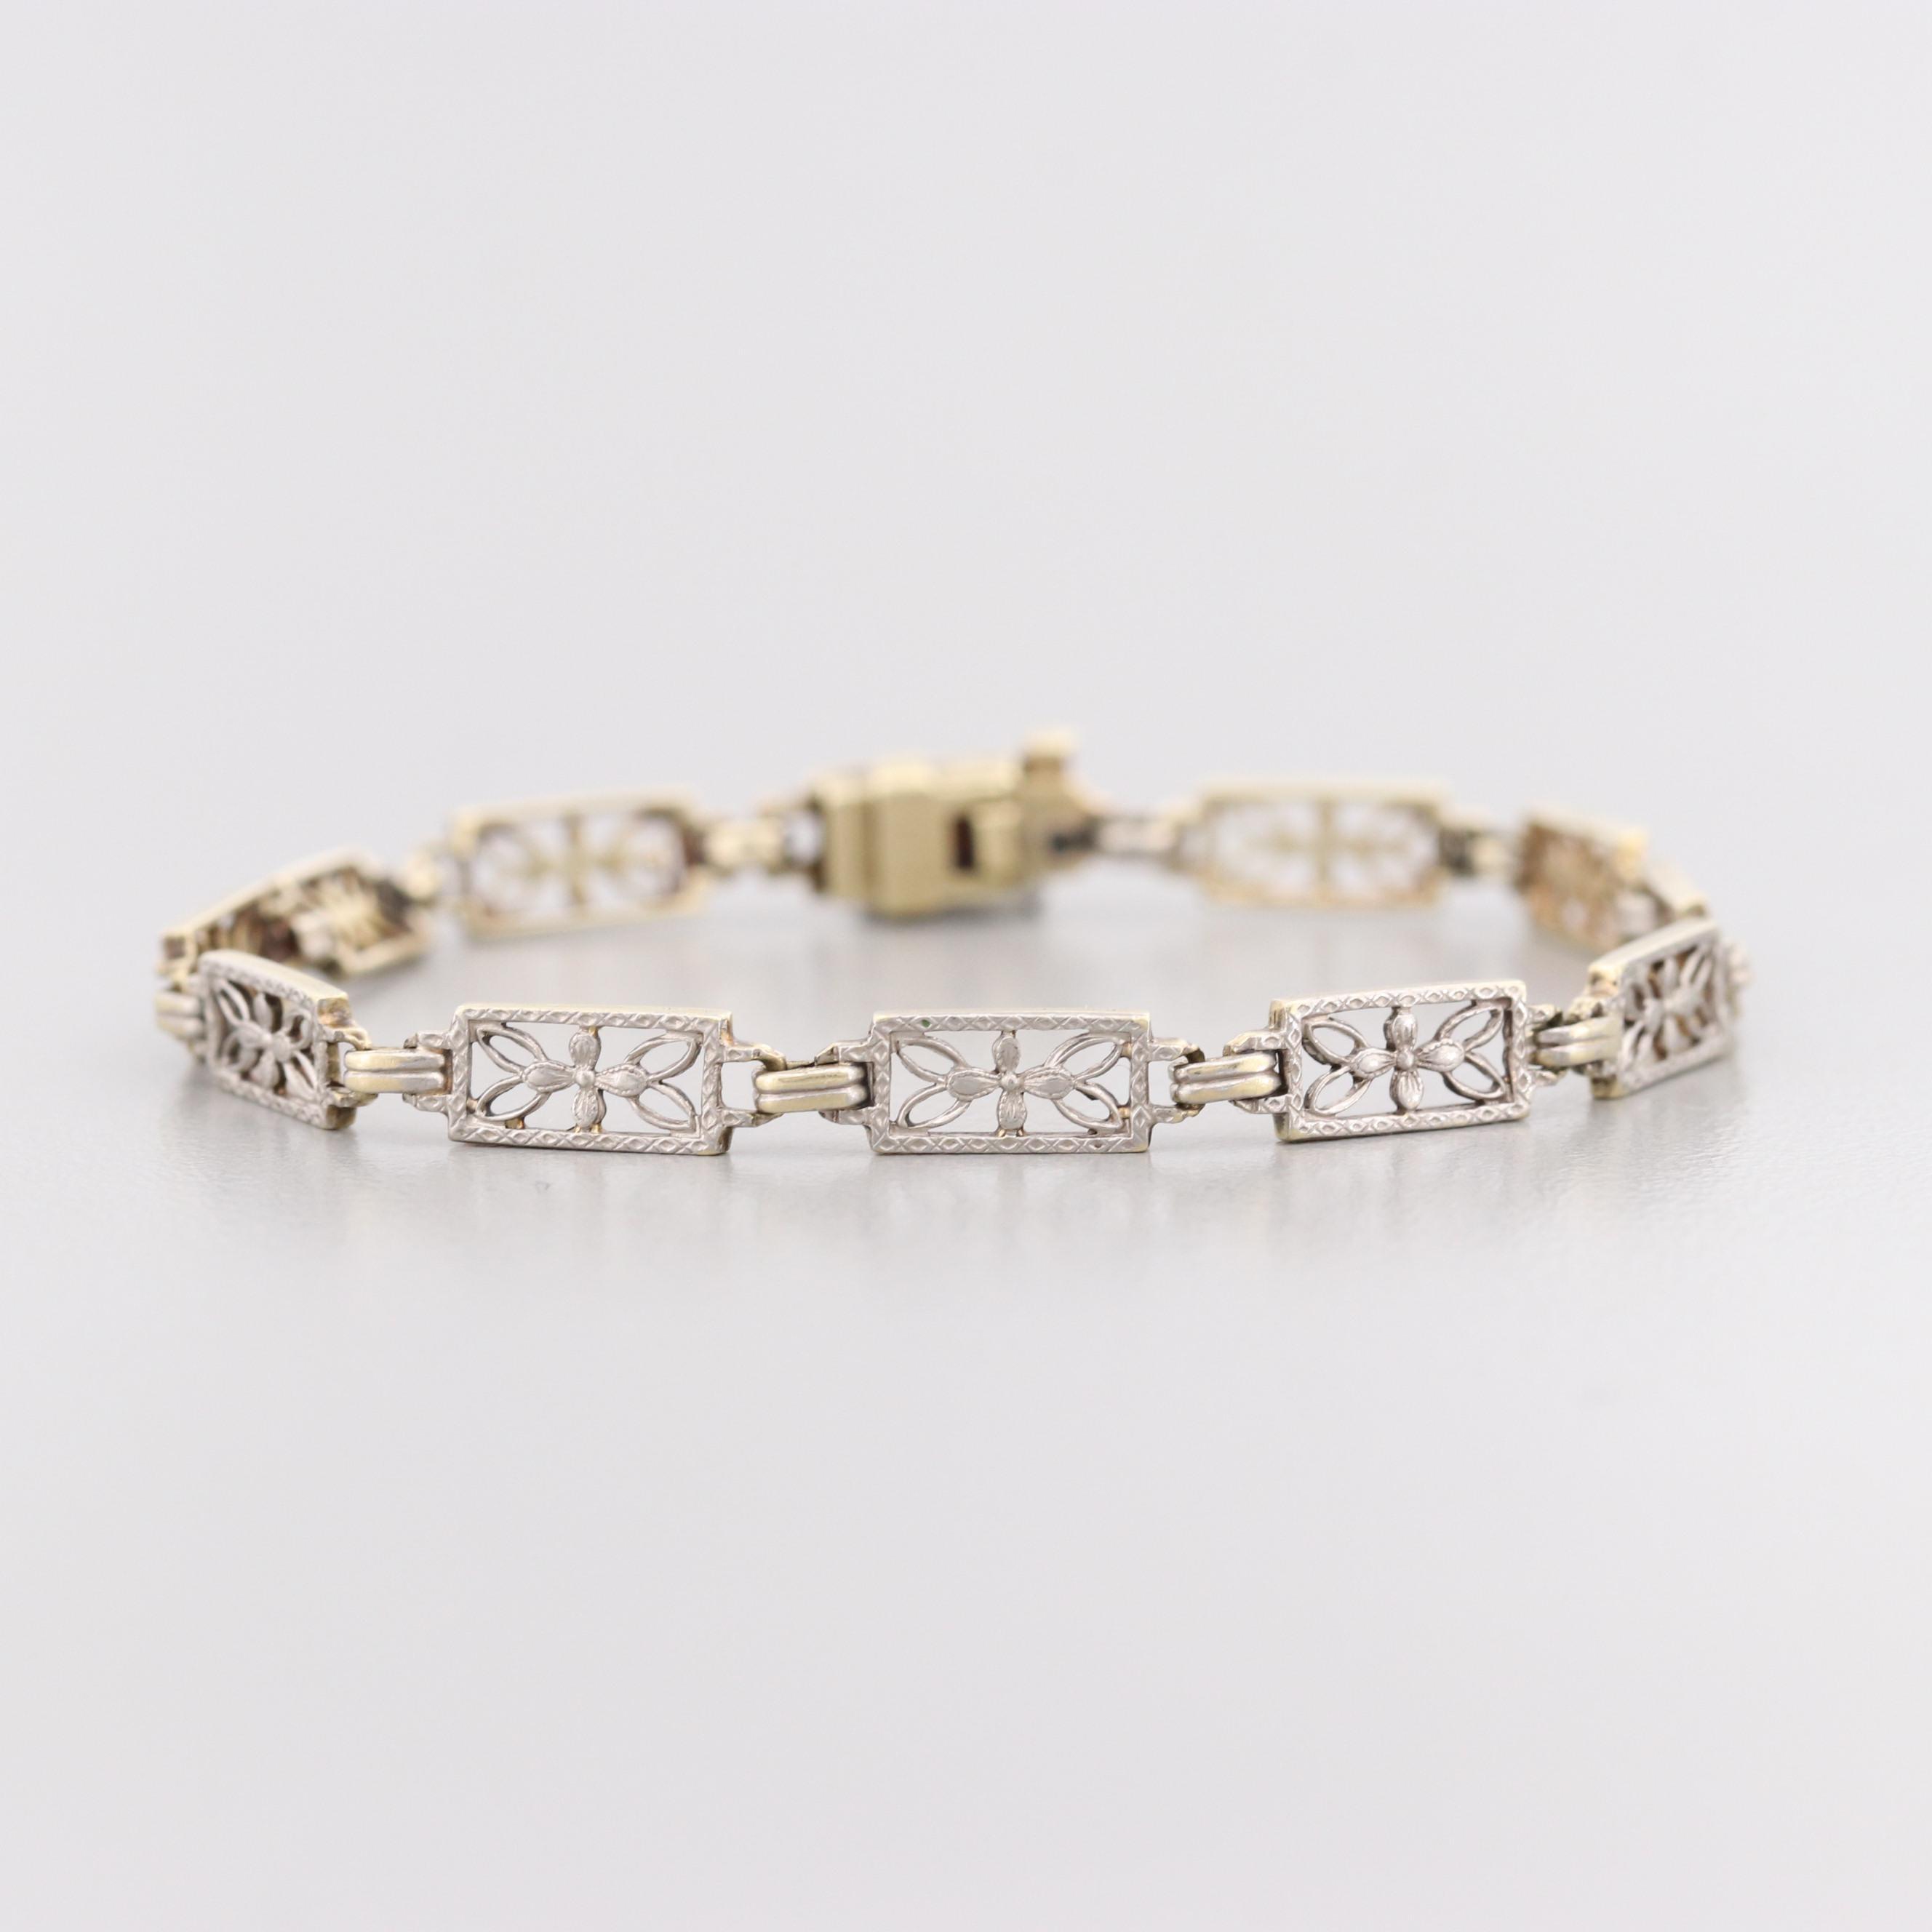 Edwardian 14K Yellow Gold and Platinum Bracelet